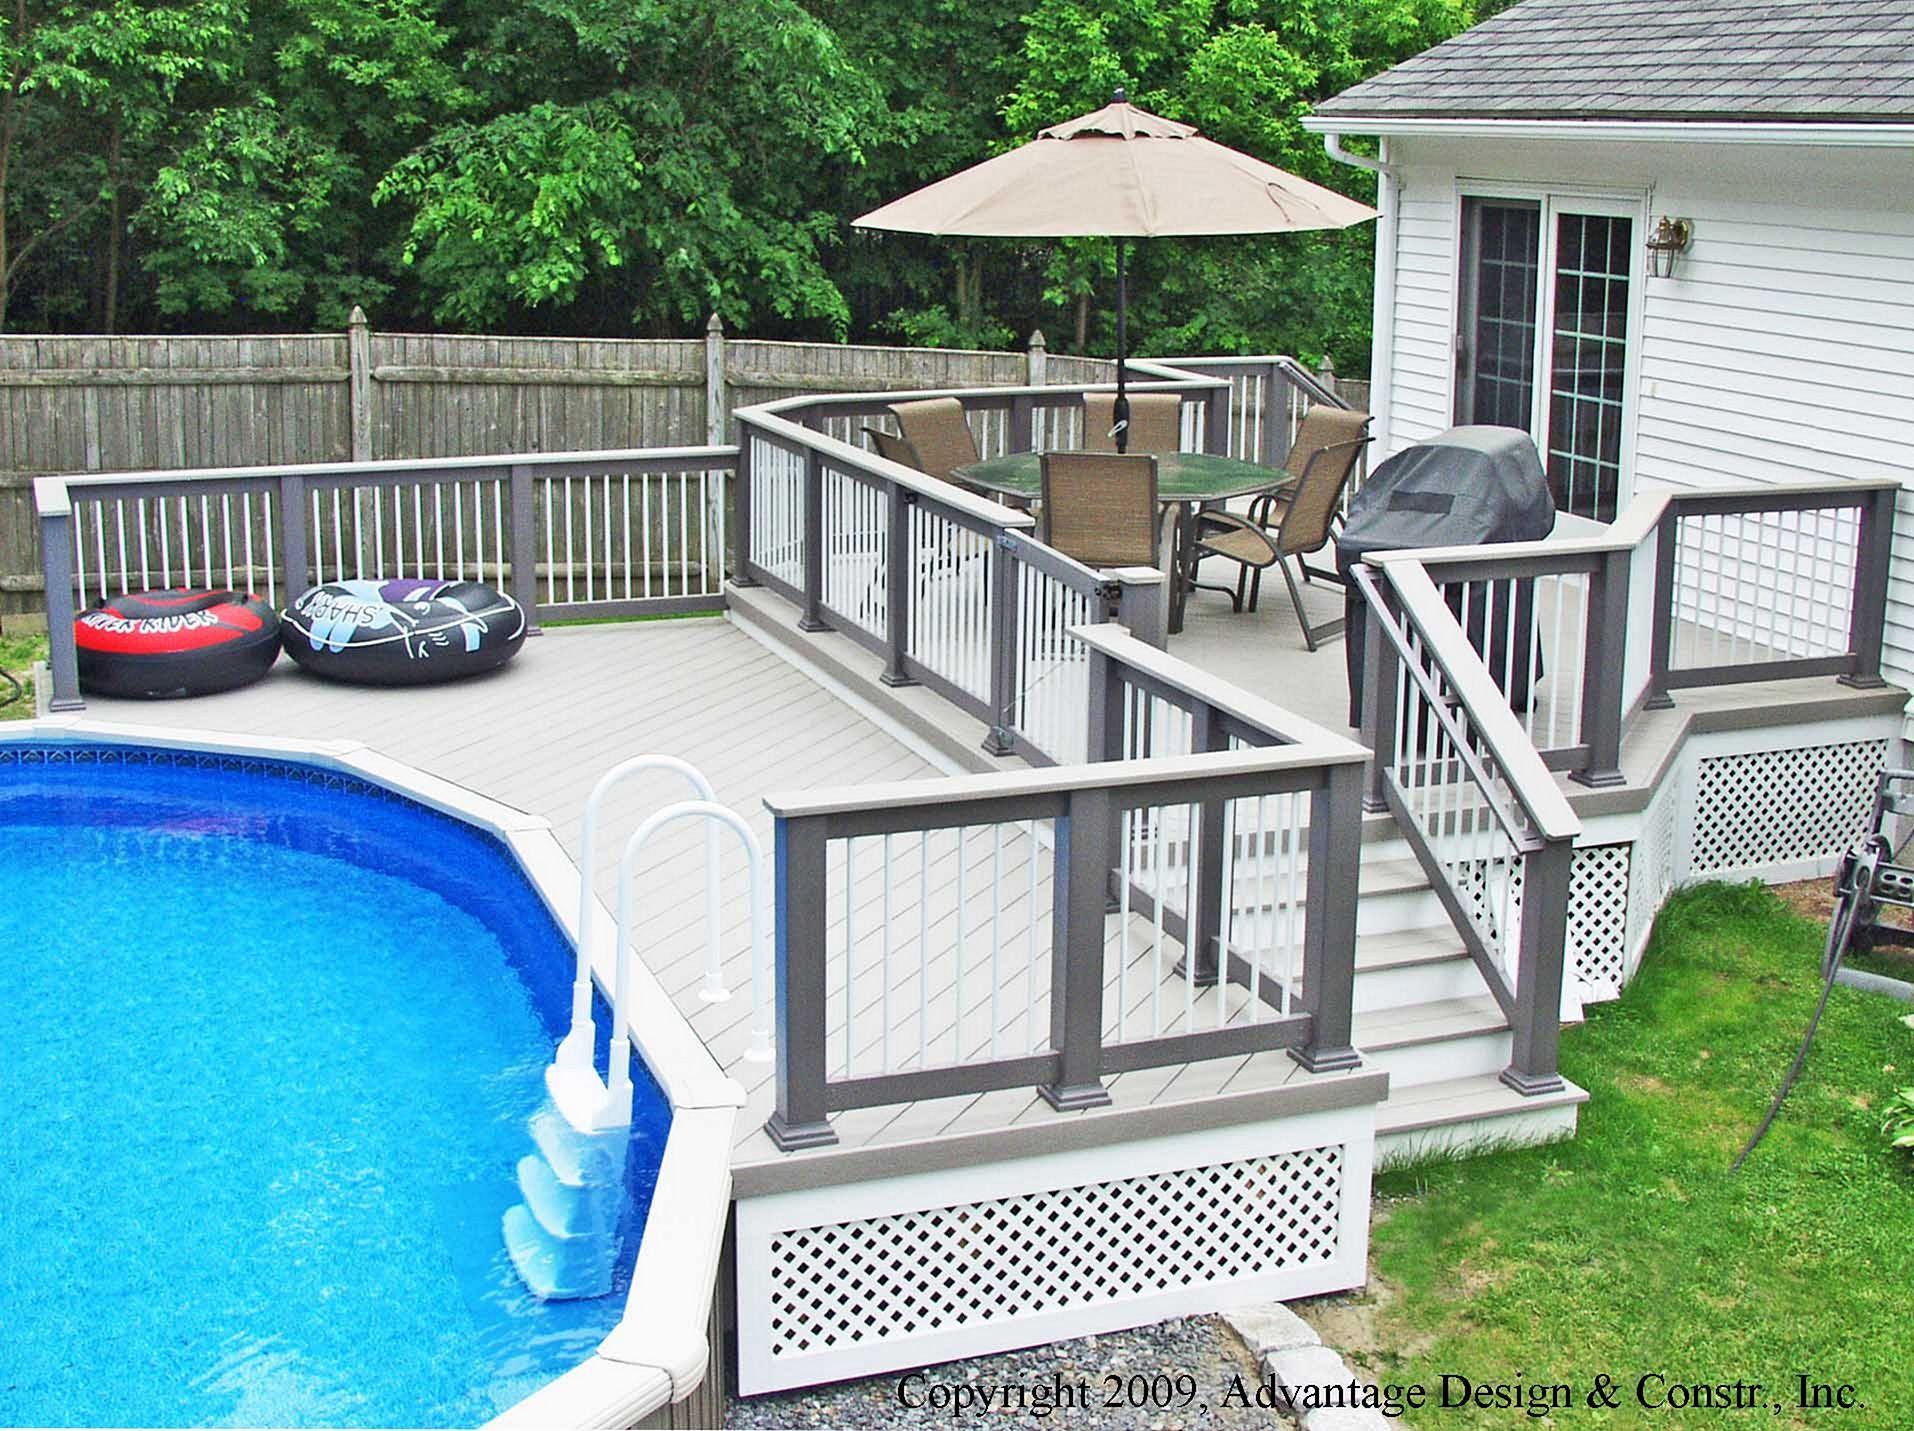 Top 44 Diy Above Ground Pool Ideas On A Budget Backyard Pool